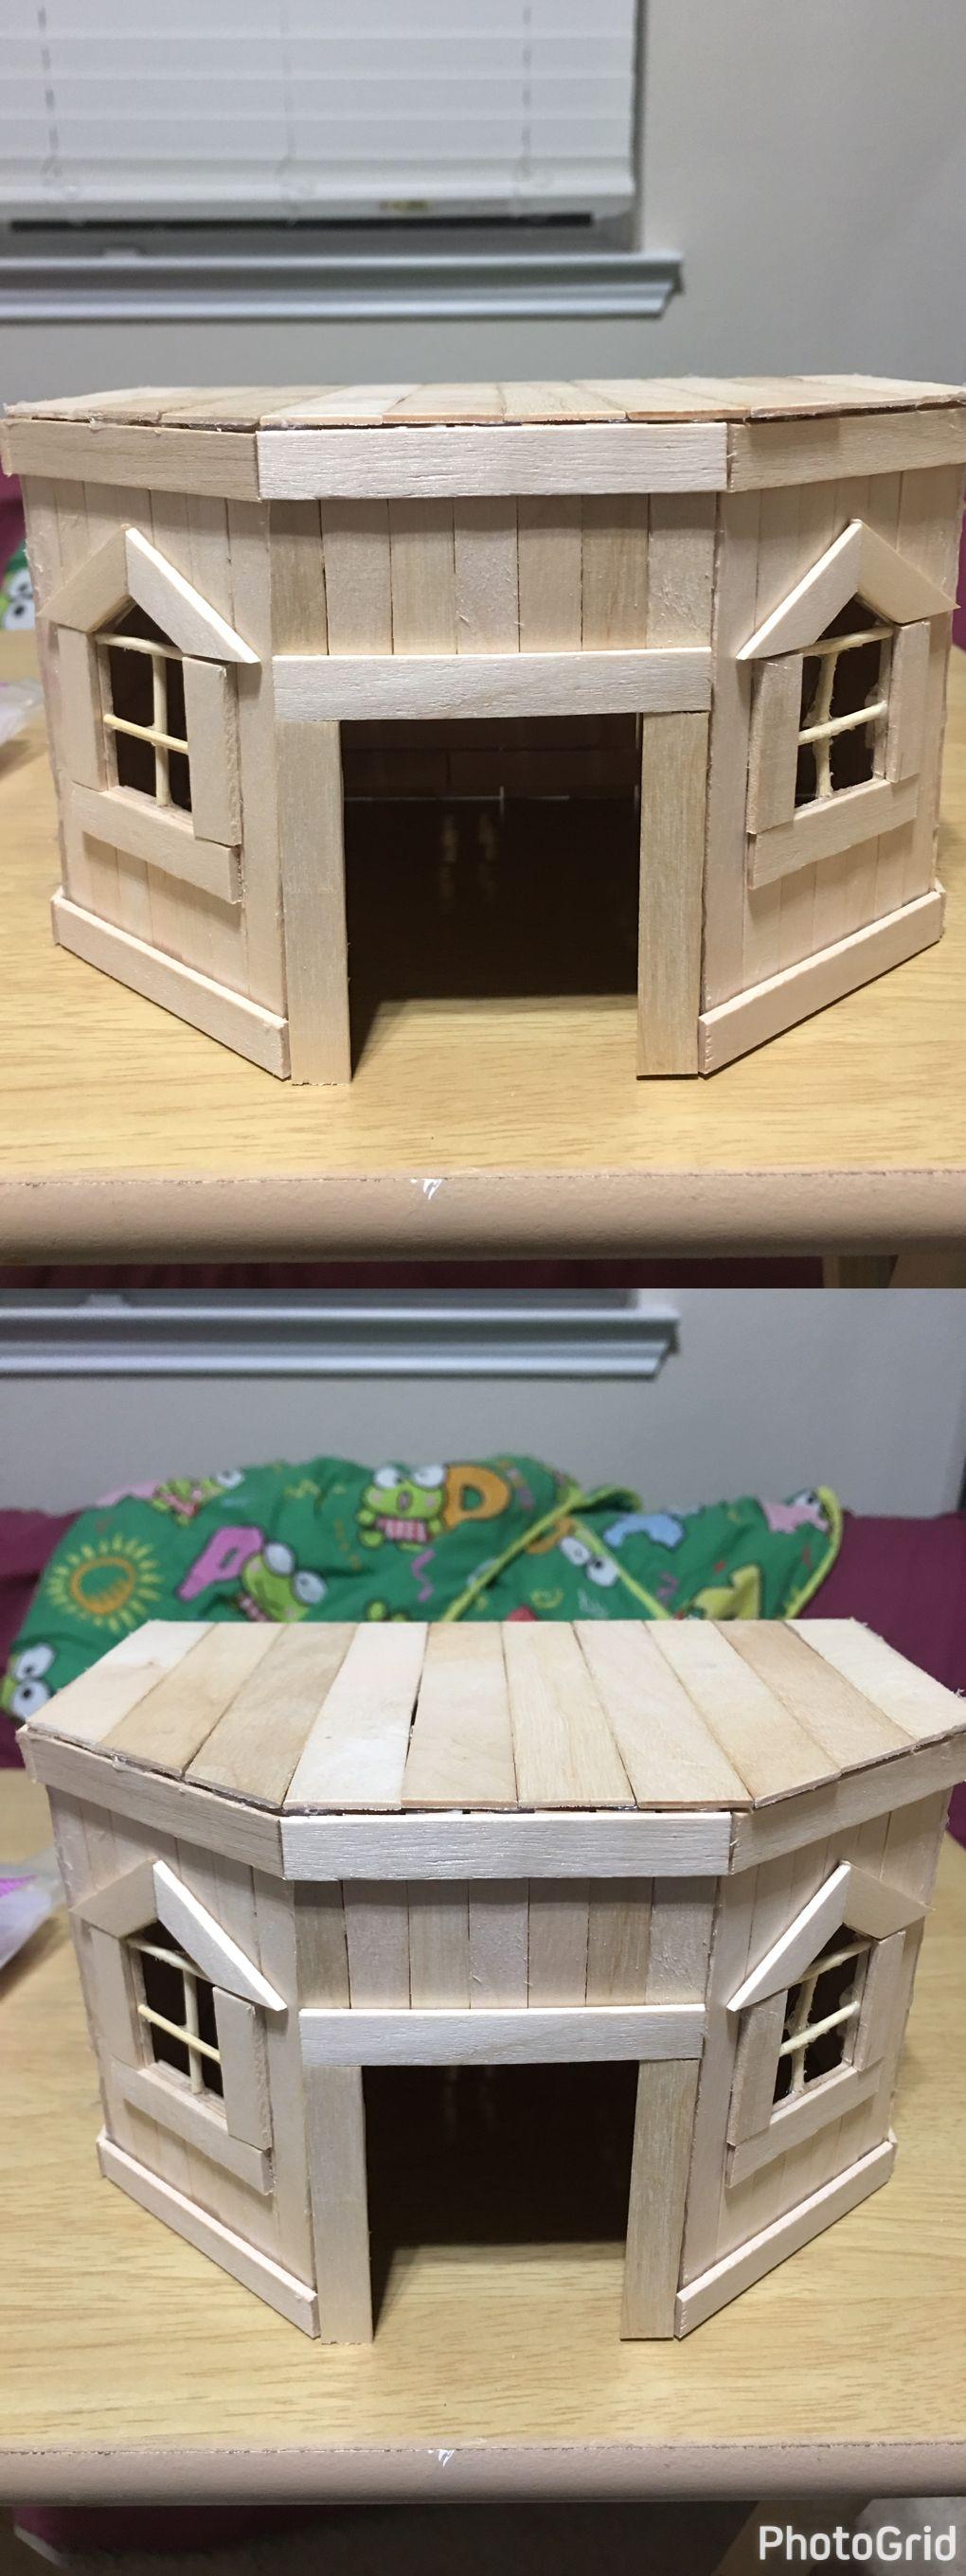 DIY Fairy House Idea Popsicle Sticks Iu0027d Make A Pointed Roof